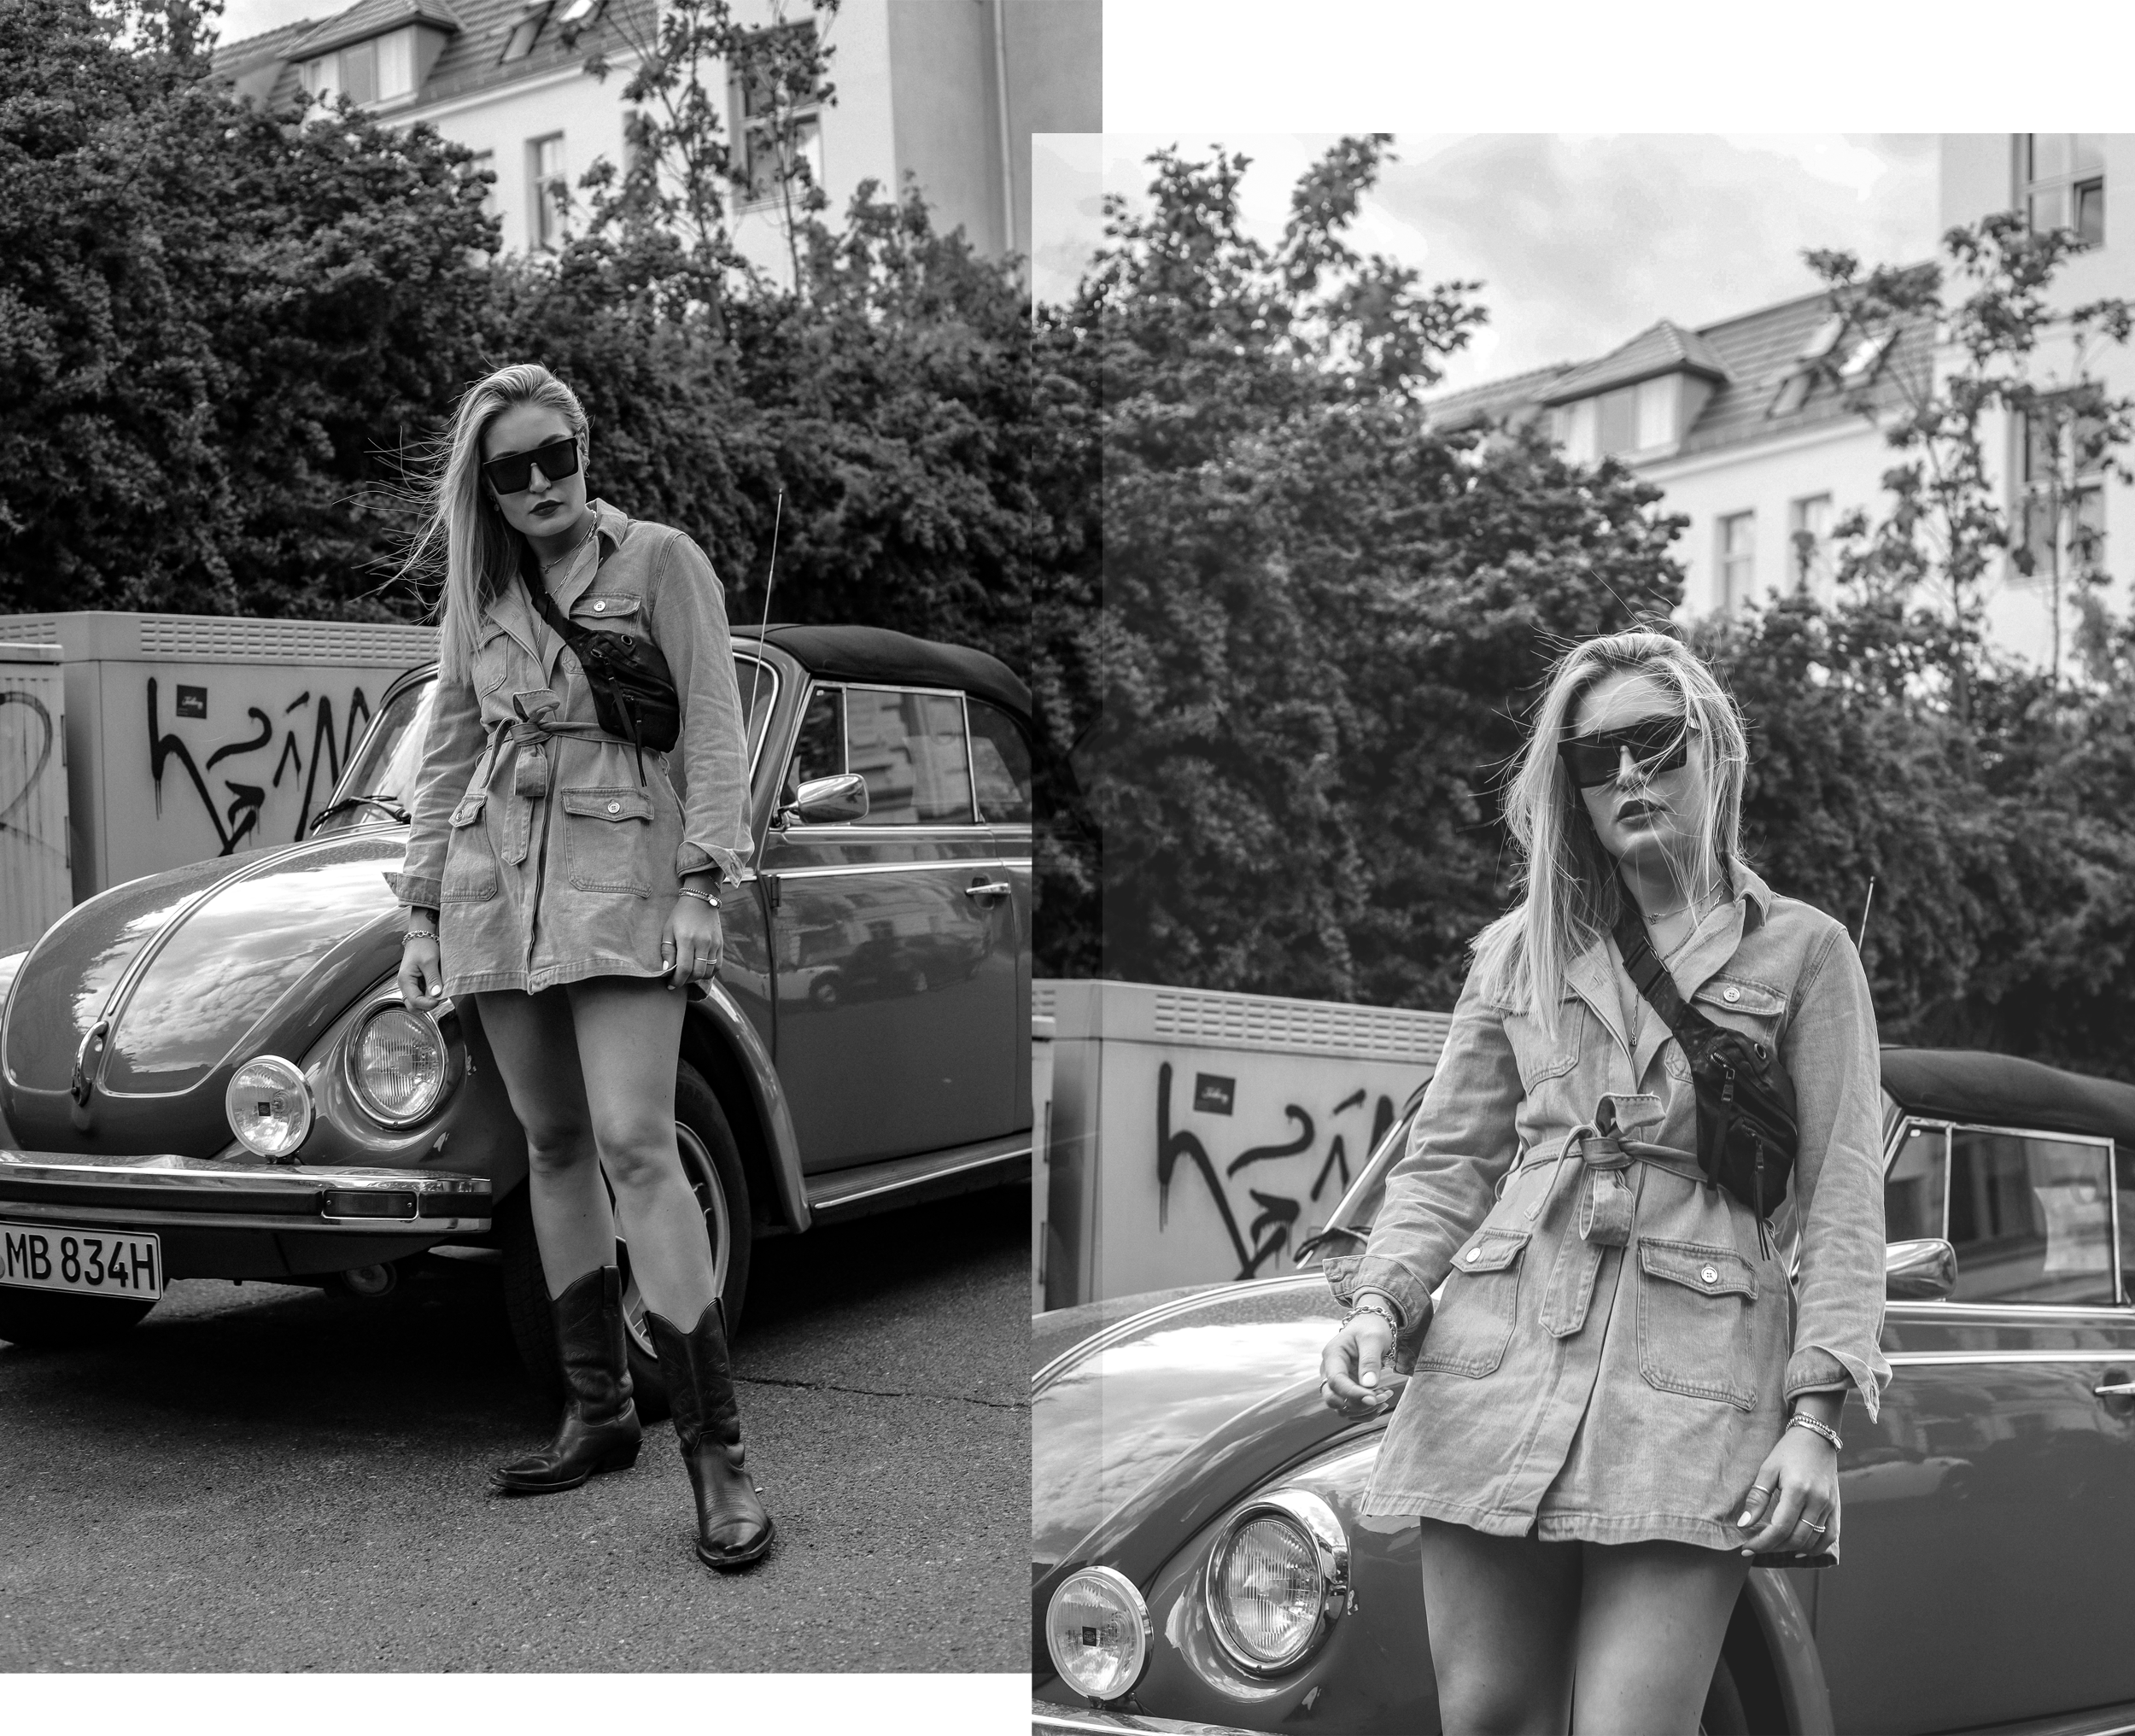 lauralamode-blogger-jeans-denim-denim dress-autumn-outfit-fashion-fashionblogger-modeblogger-inspo-streetstyle-berlin-fashionblogger berlin-deutschland-munich